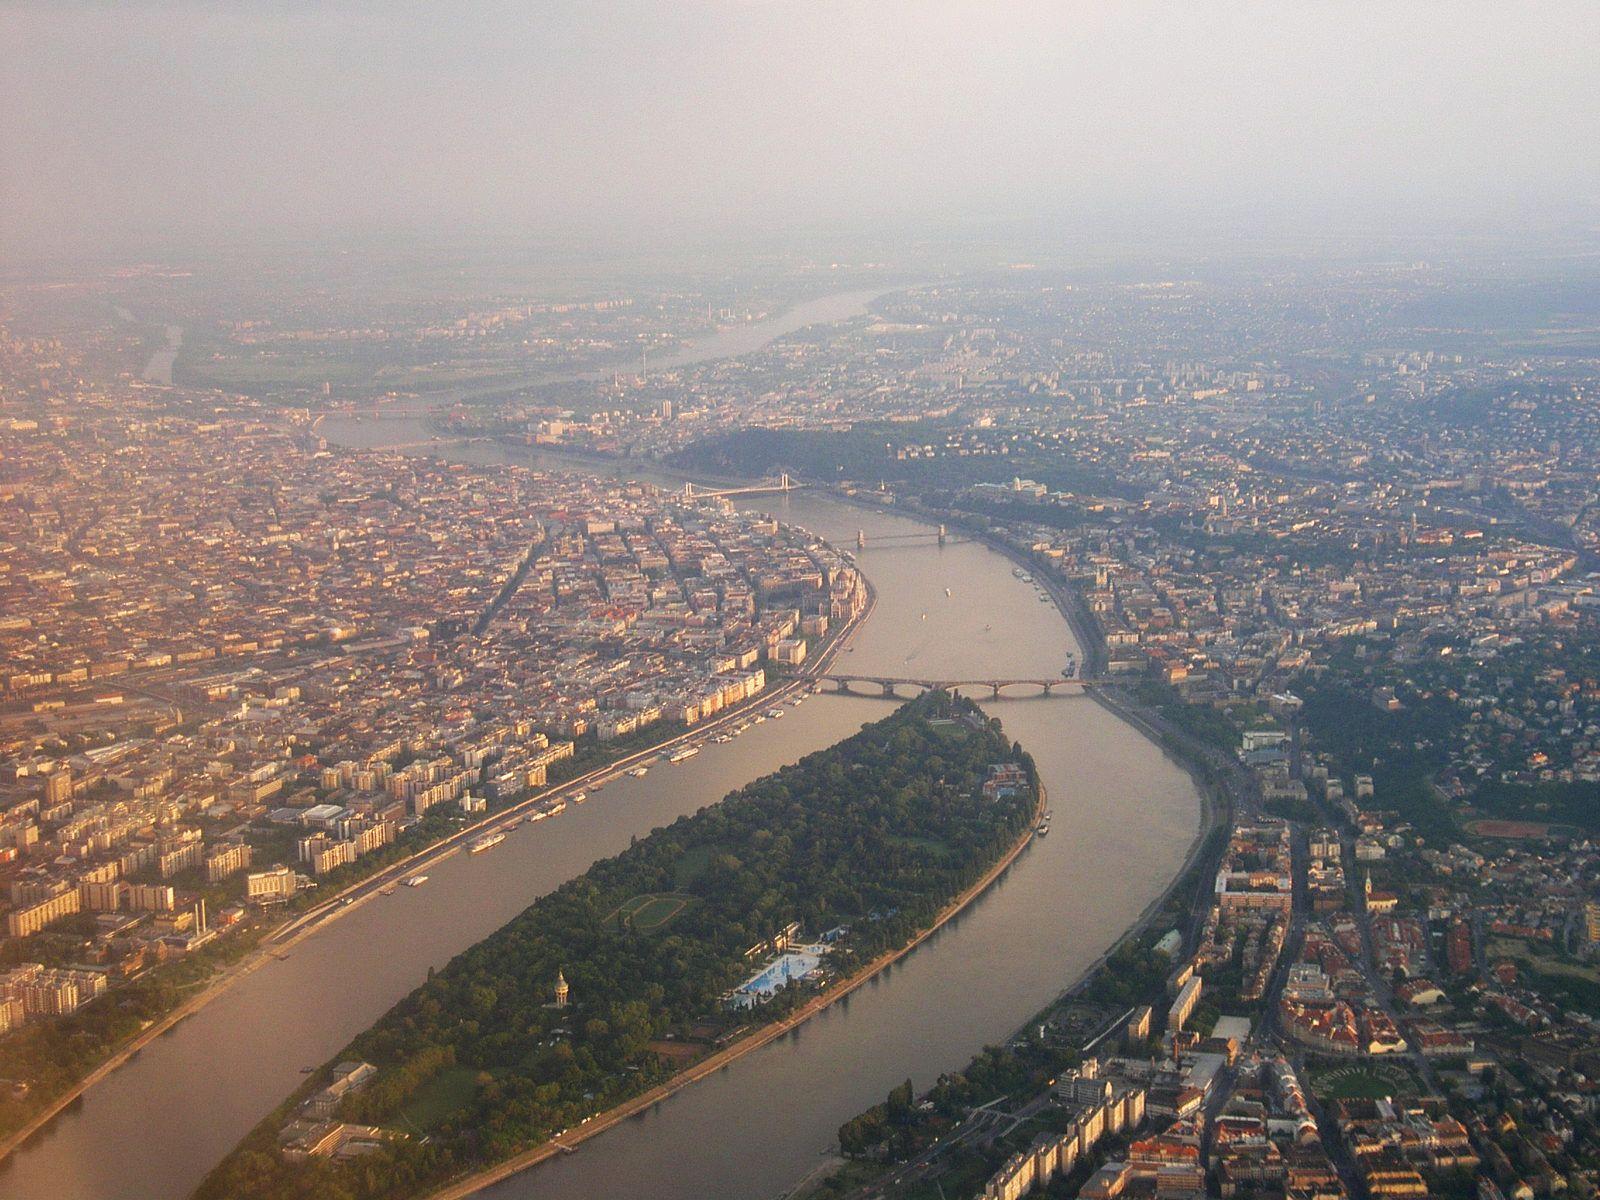 guia-low-cost-a-budapest-hungria-viajar-con-poco-dinero